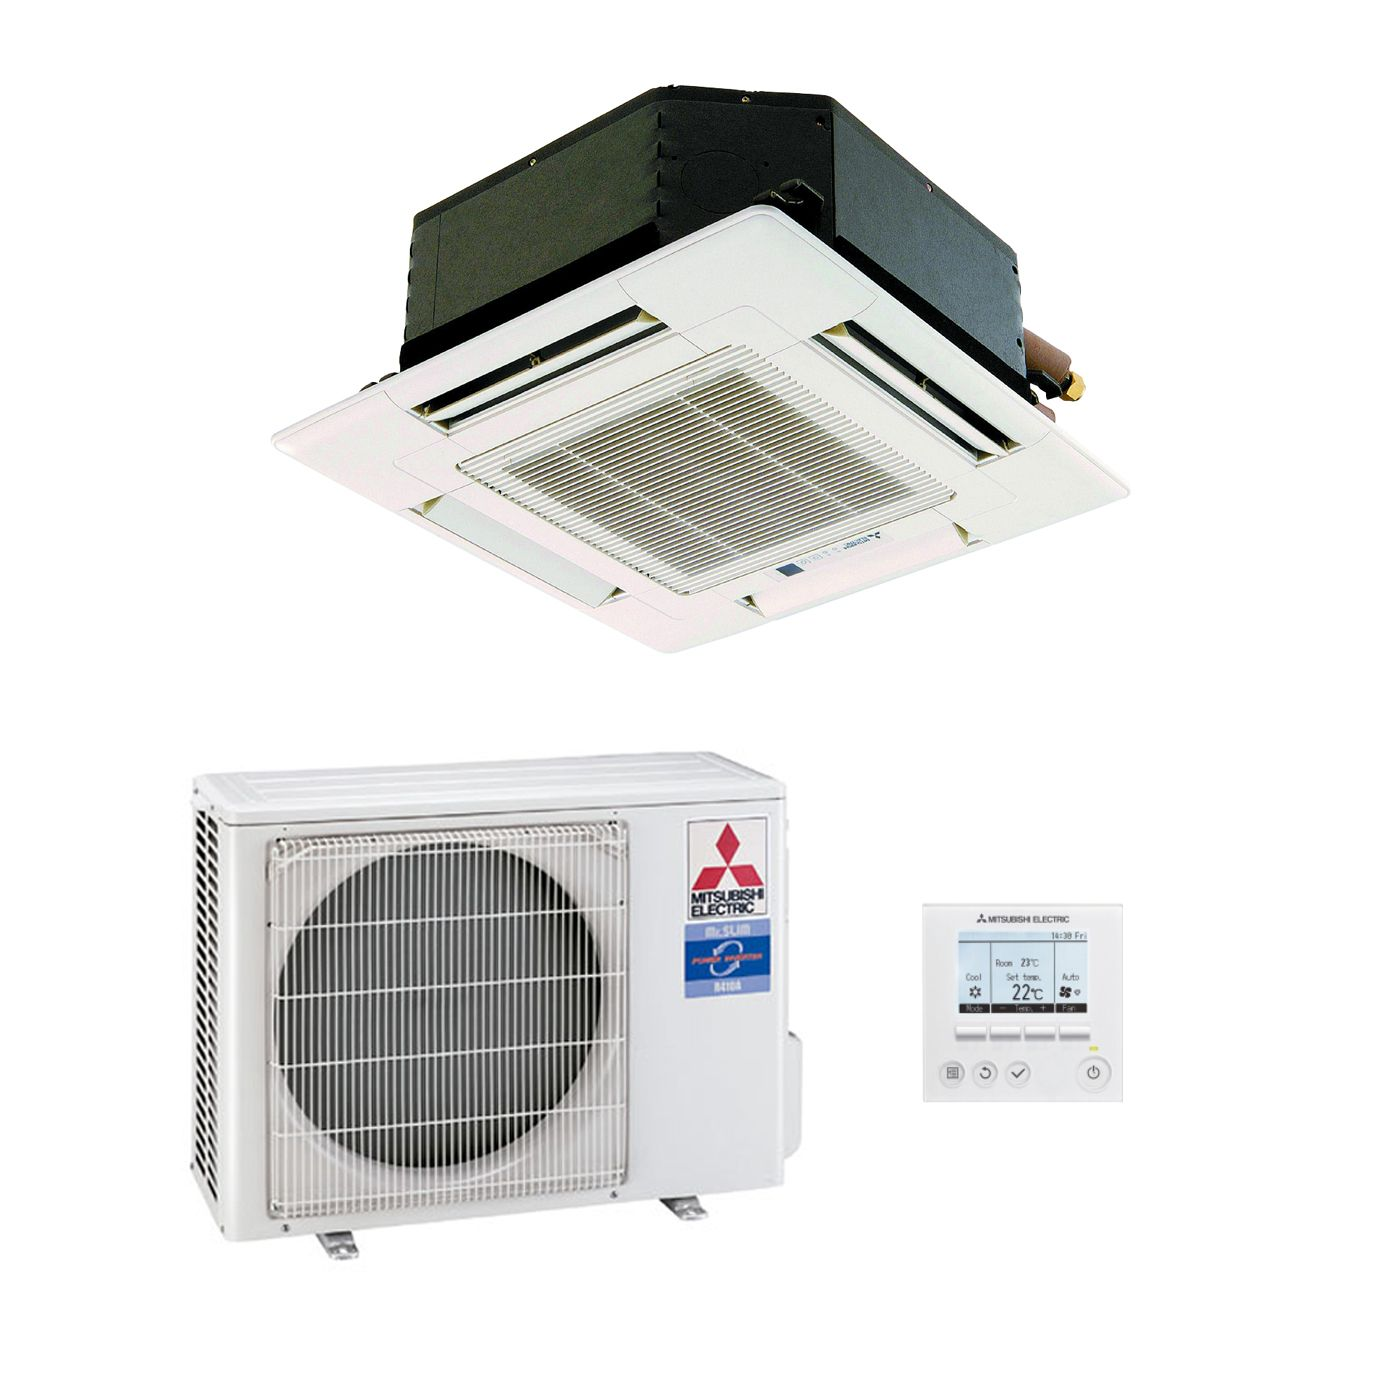 pump us gas my split furnace ductless com is mini vs why minisplits greenbuildingadvisor loving airfurnace mitsubishi considered trane heat underrated minisplit